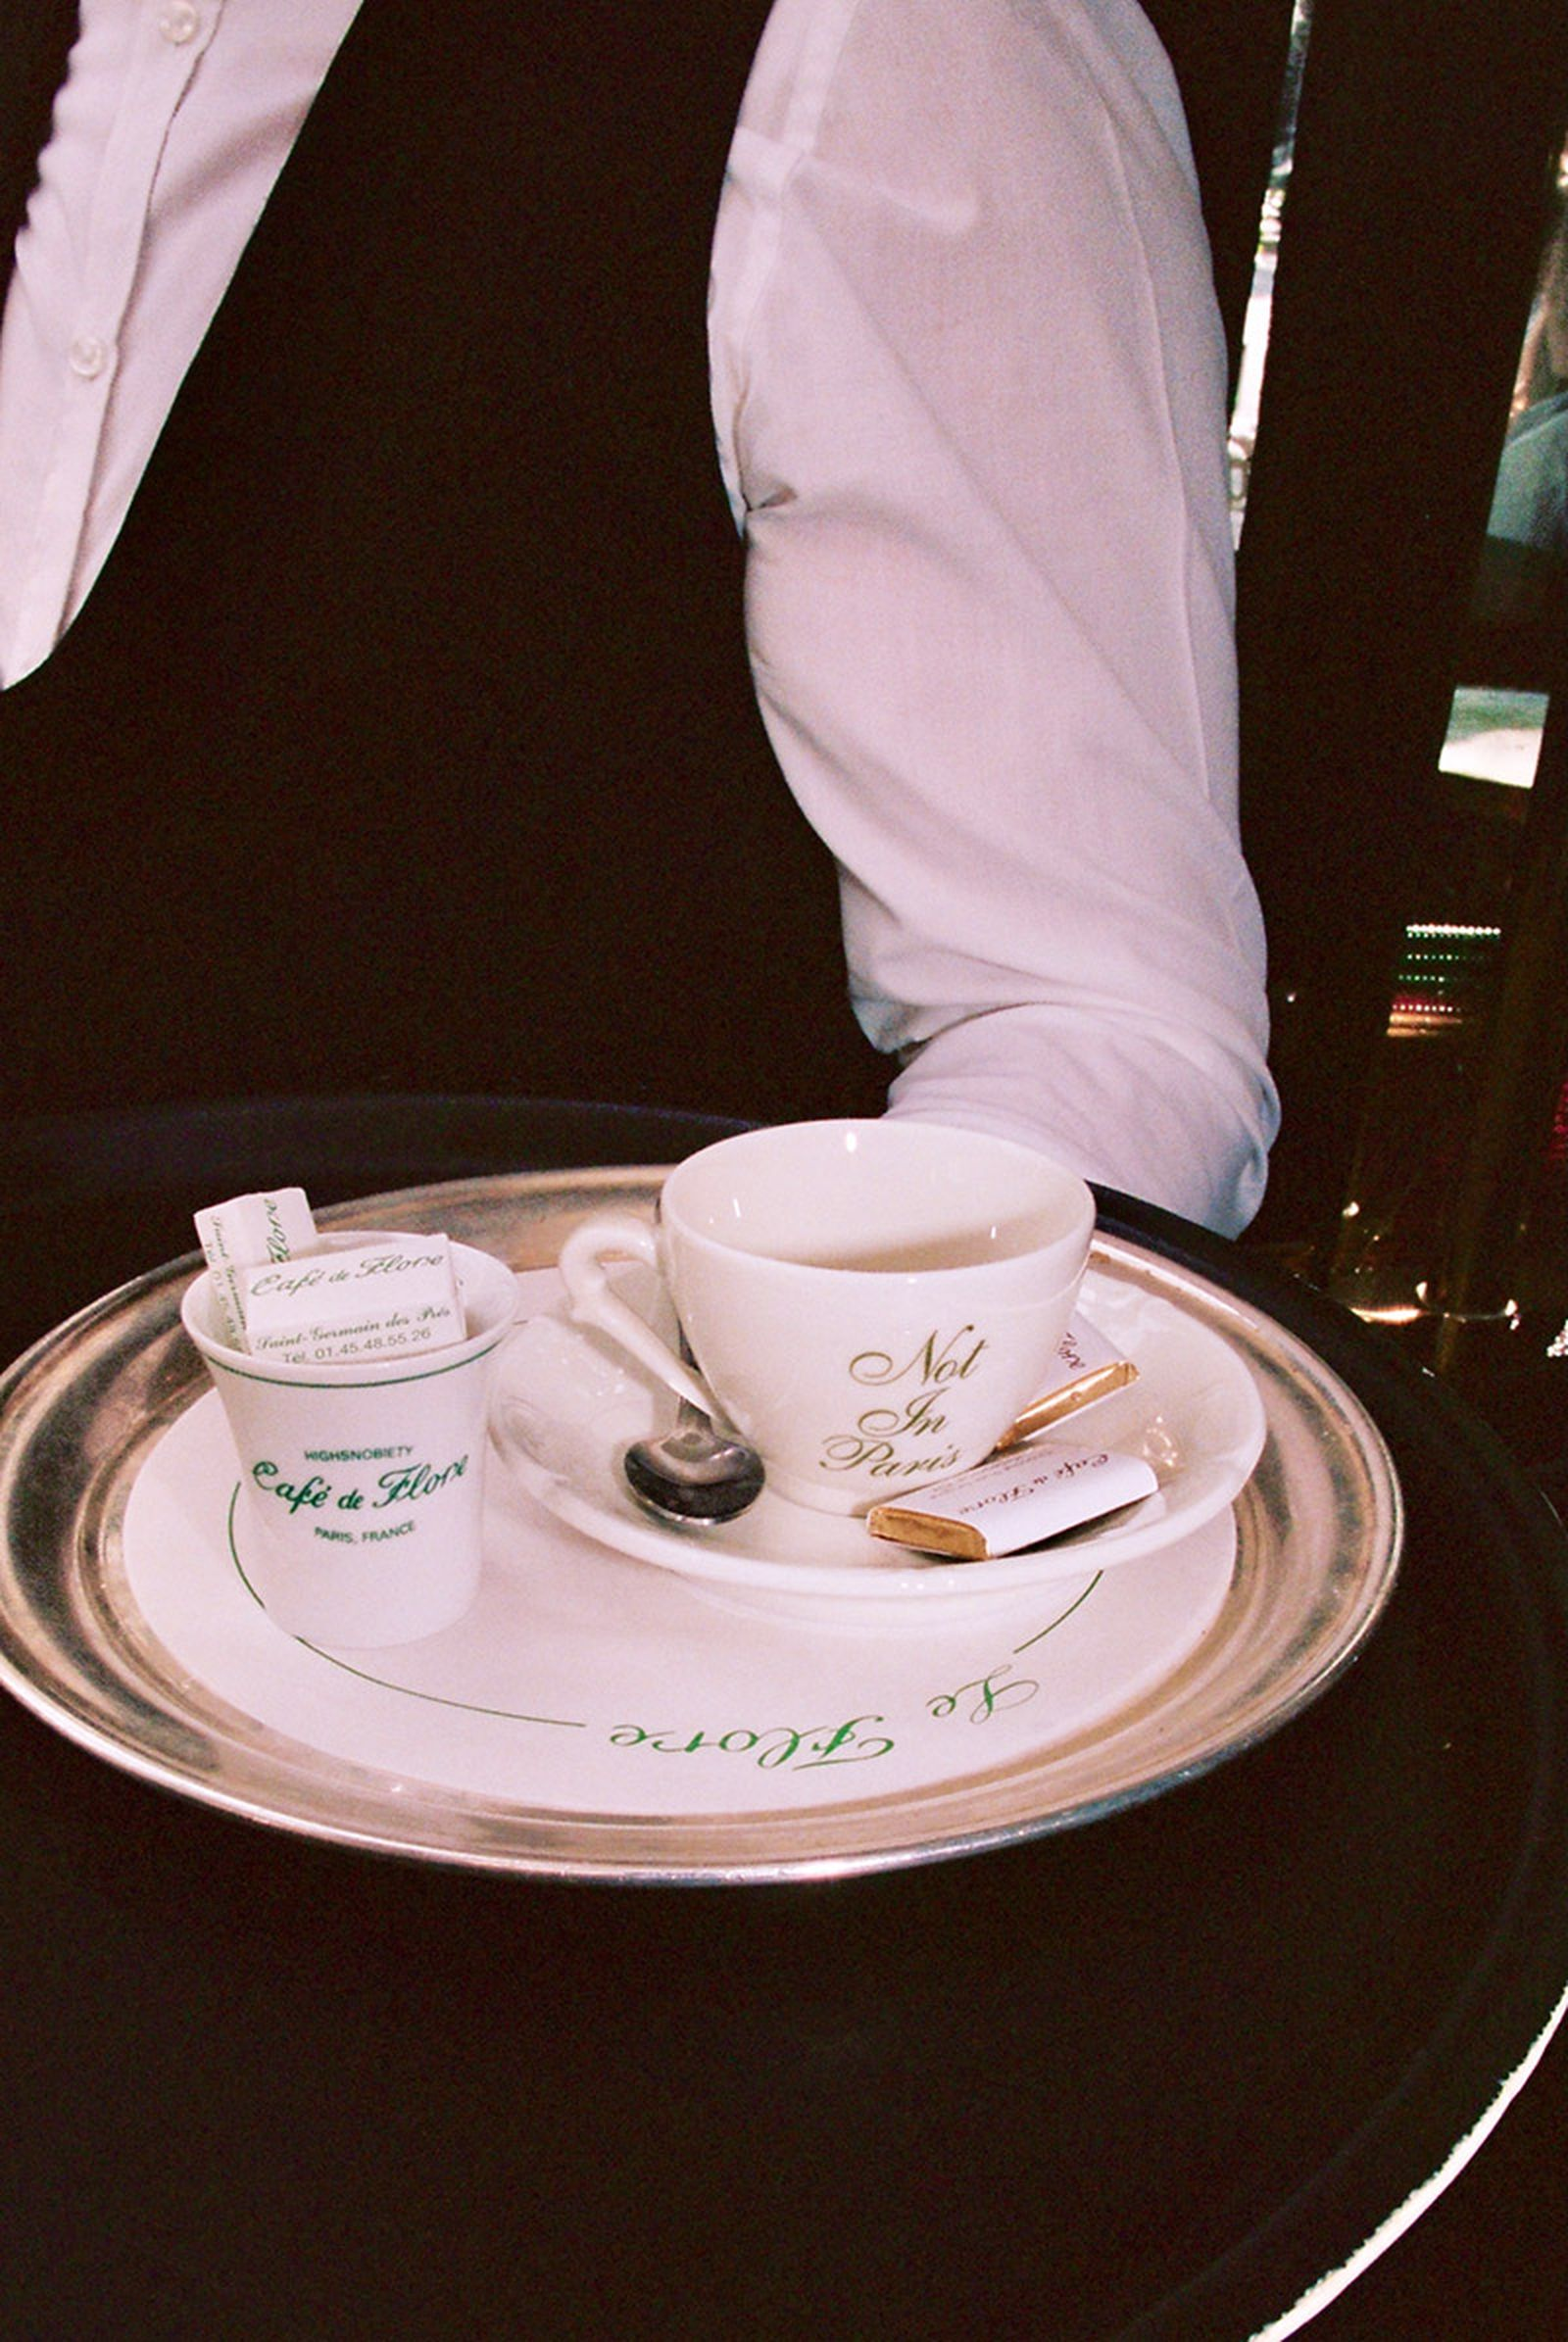 cafe-de-flore-fashion-week-not-in-paris-lookbook-012